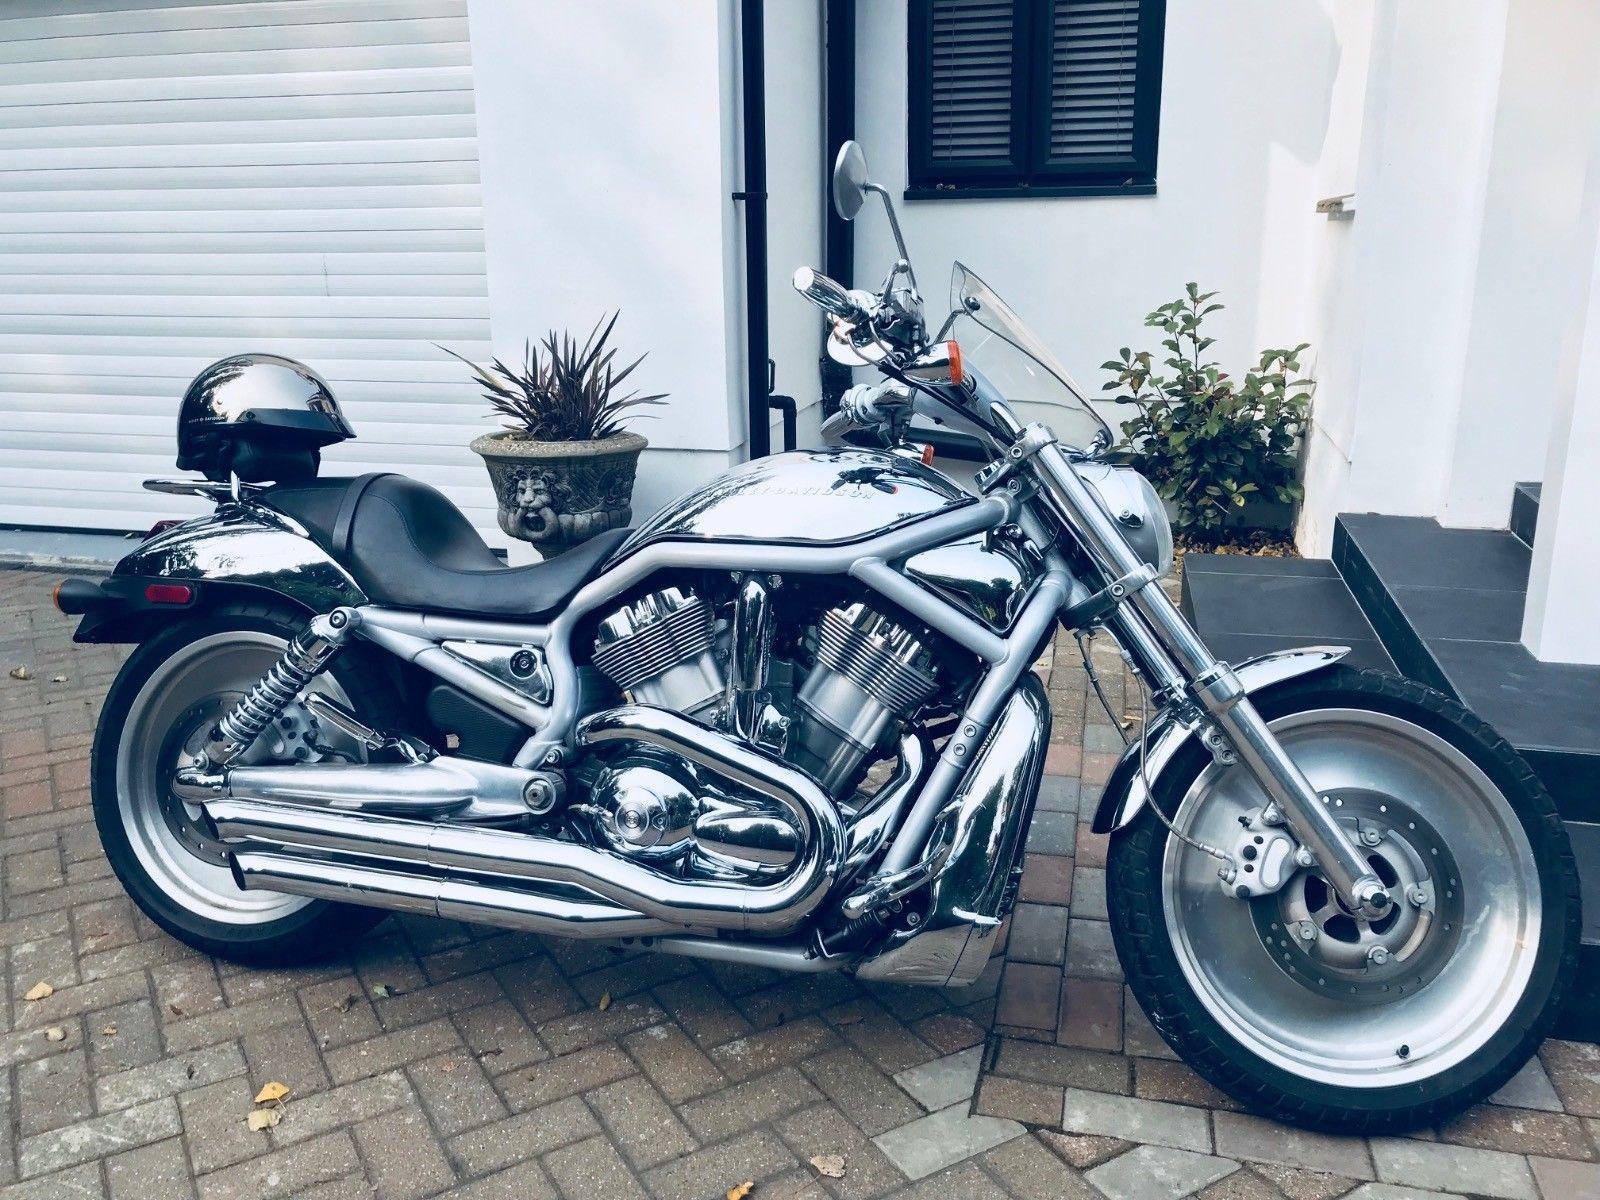 HARLEY-DAVIDSON VRSCA V-ROD ANNIVERSARY 100 'Very rare 1450cc' 2003 Harley